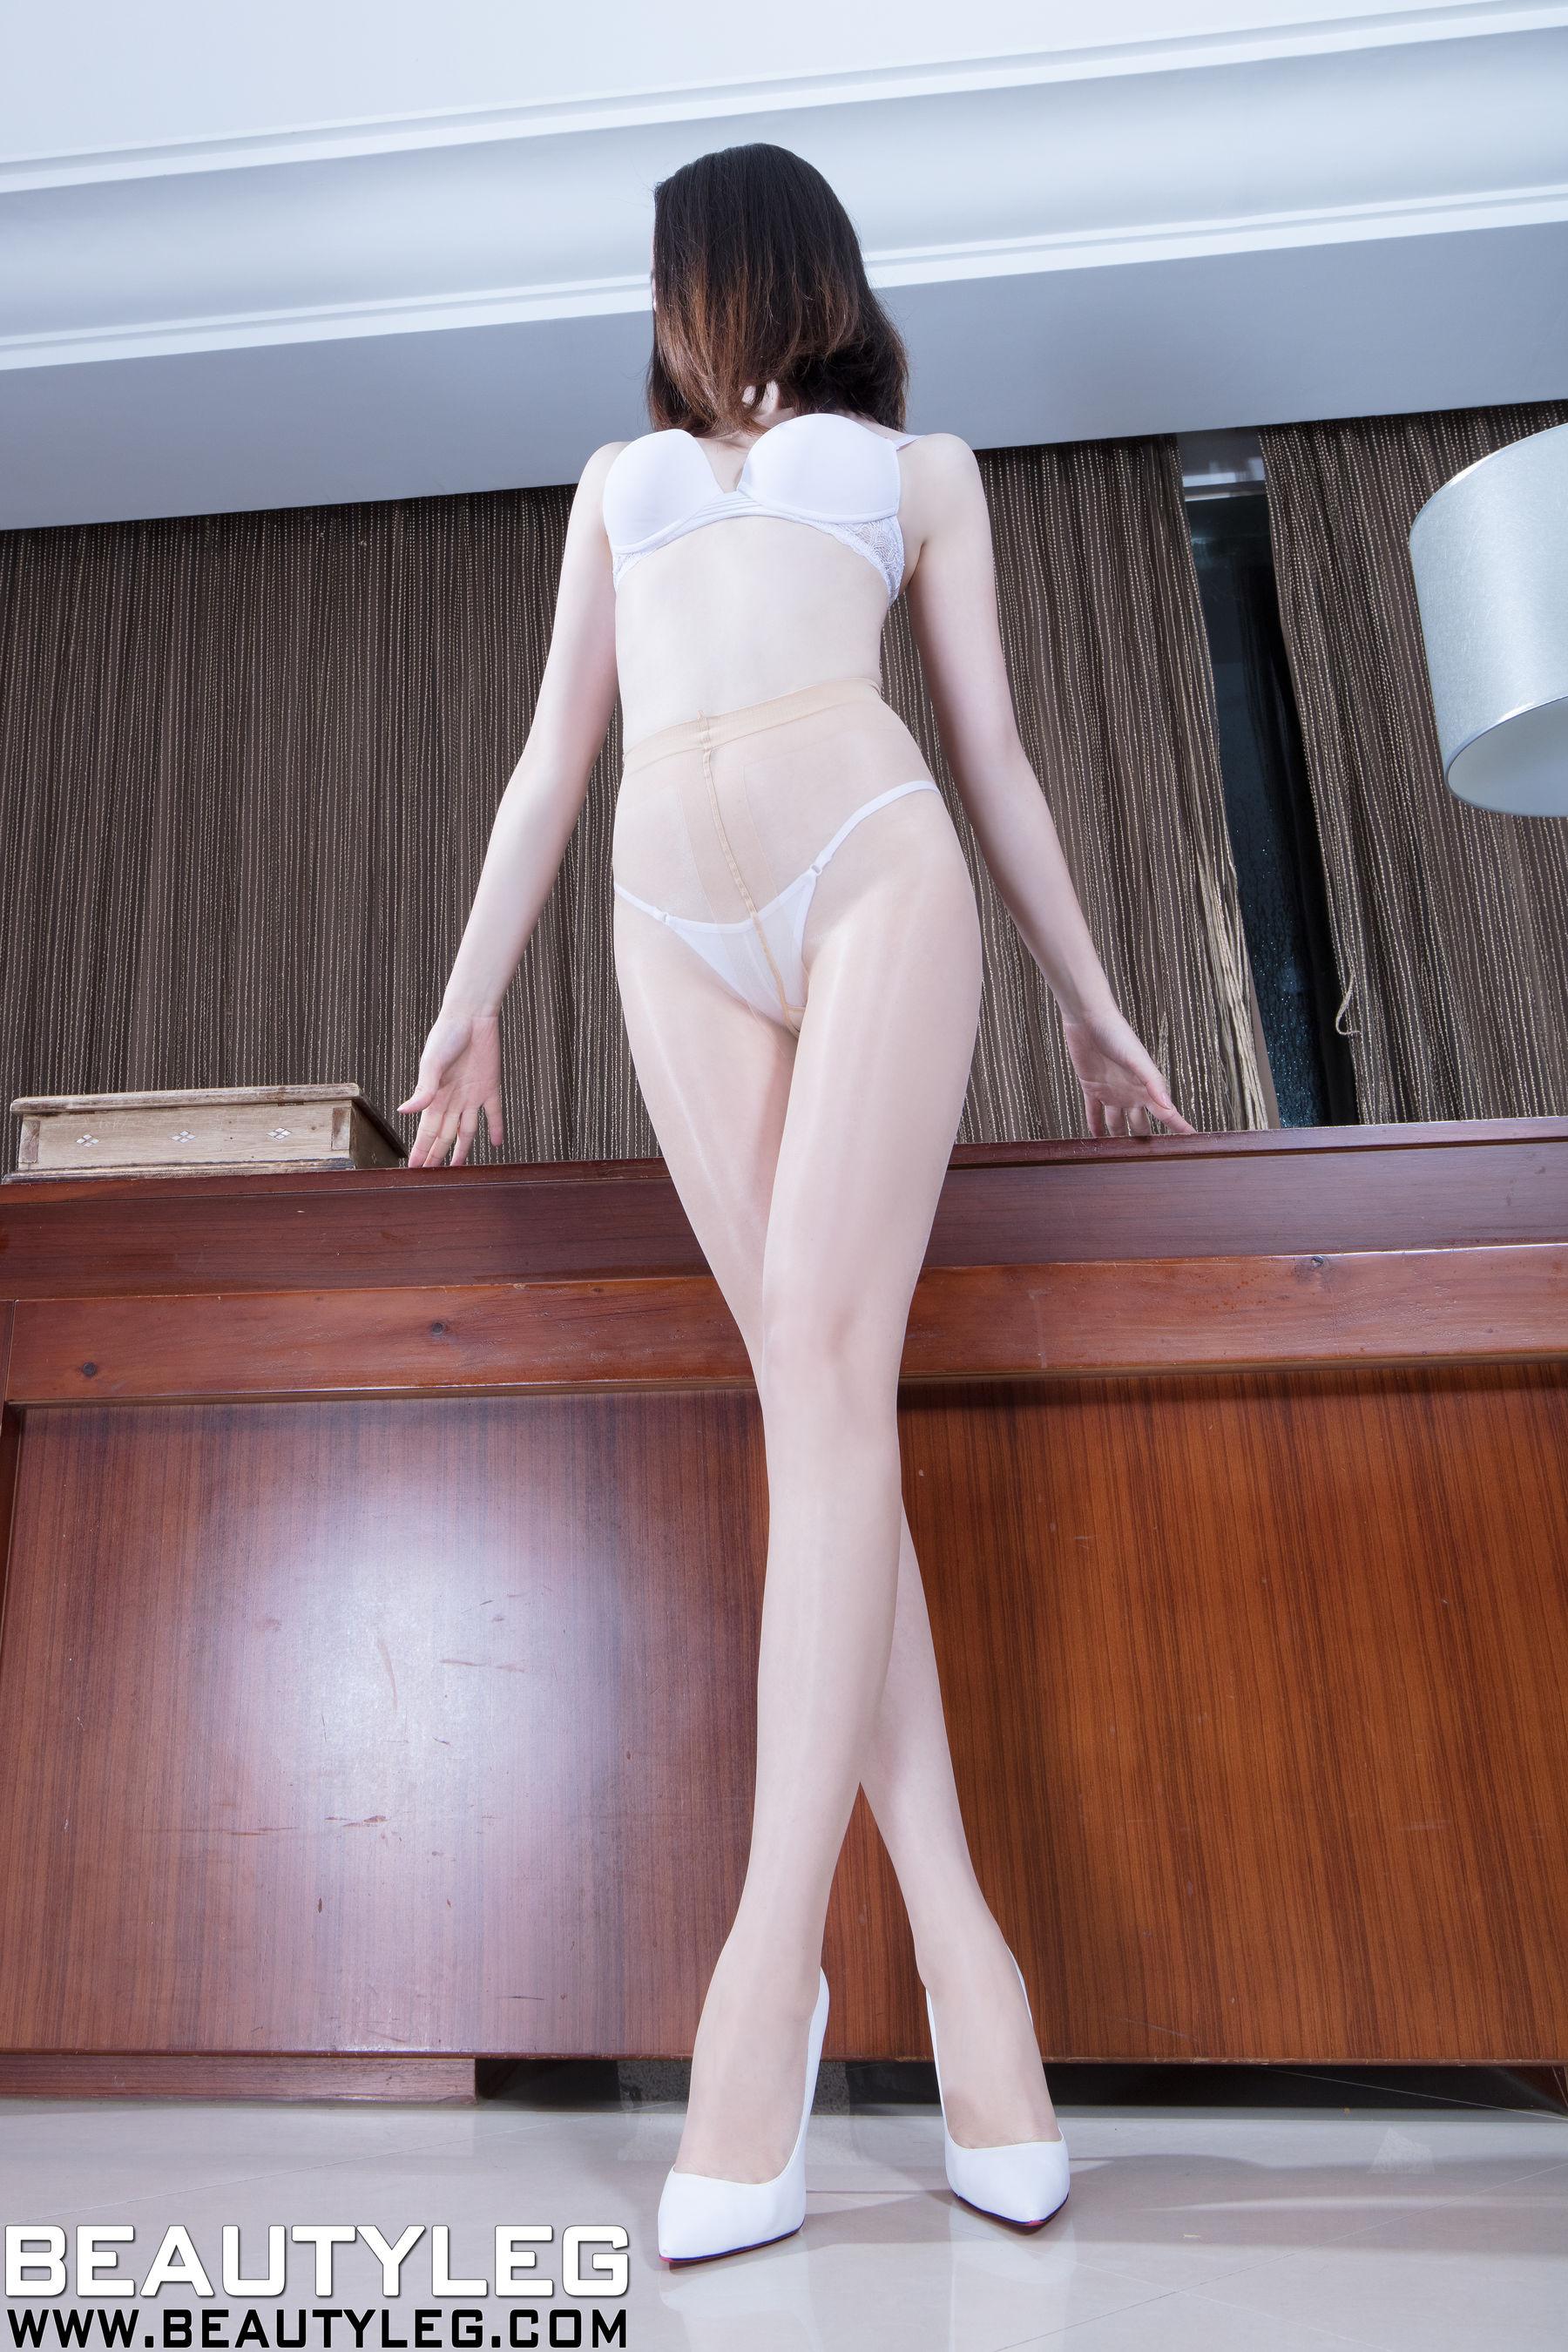 VOL.1482 [Beautyleg]丝袜美女丝袜美腿:腿模Anonymity超高清个人性感漂亮大图(59P)